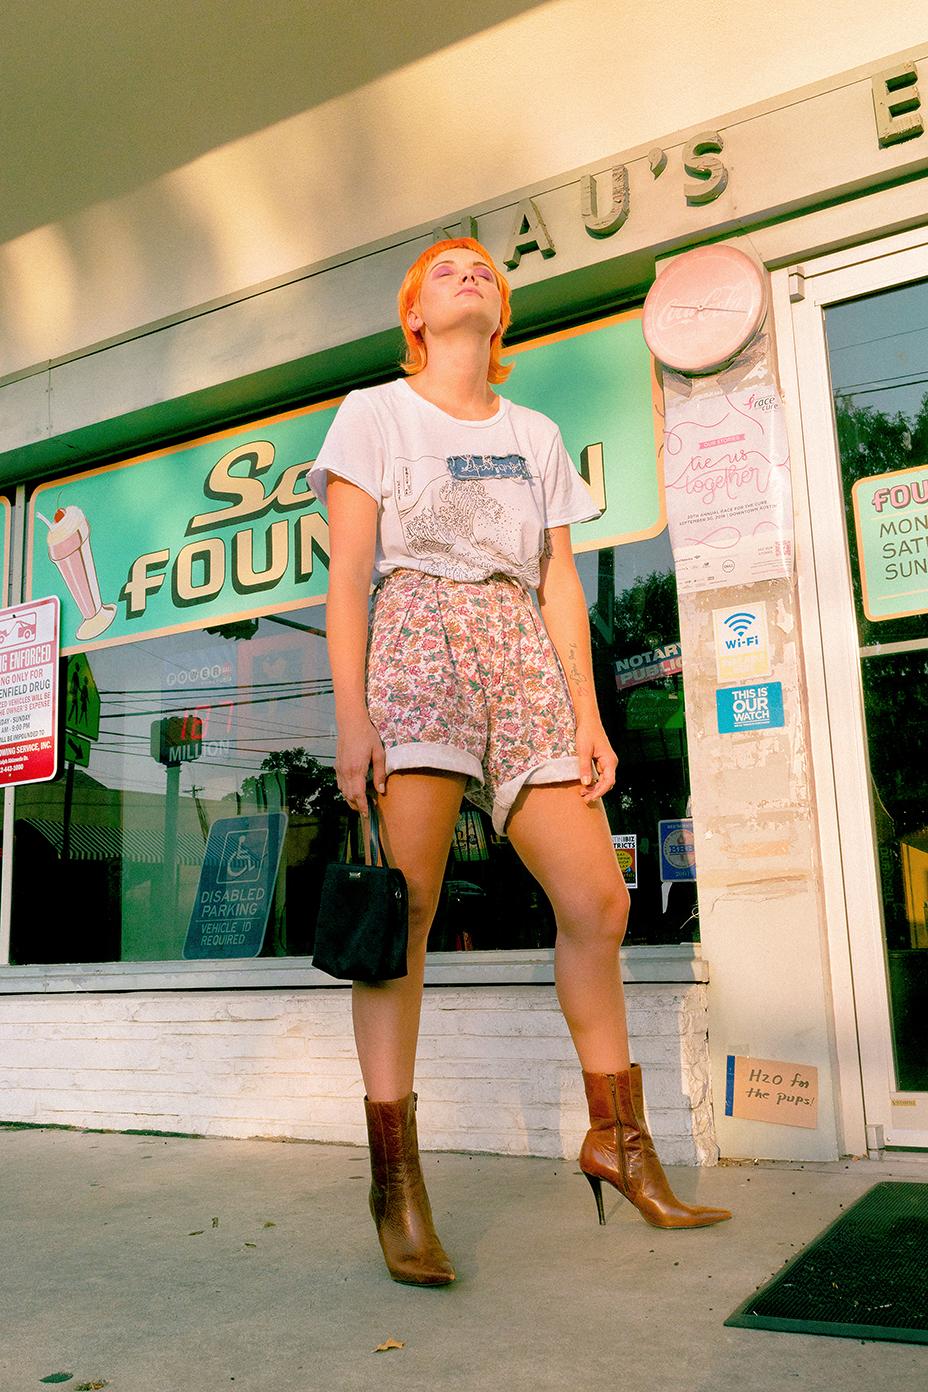 Meggie-Shorts-Tshirt-1-smaller.jpg